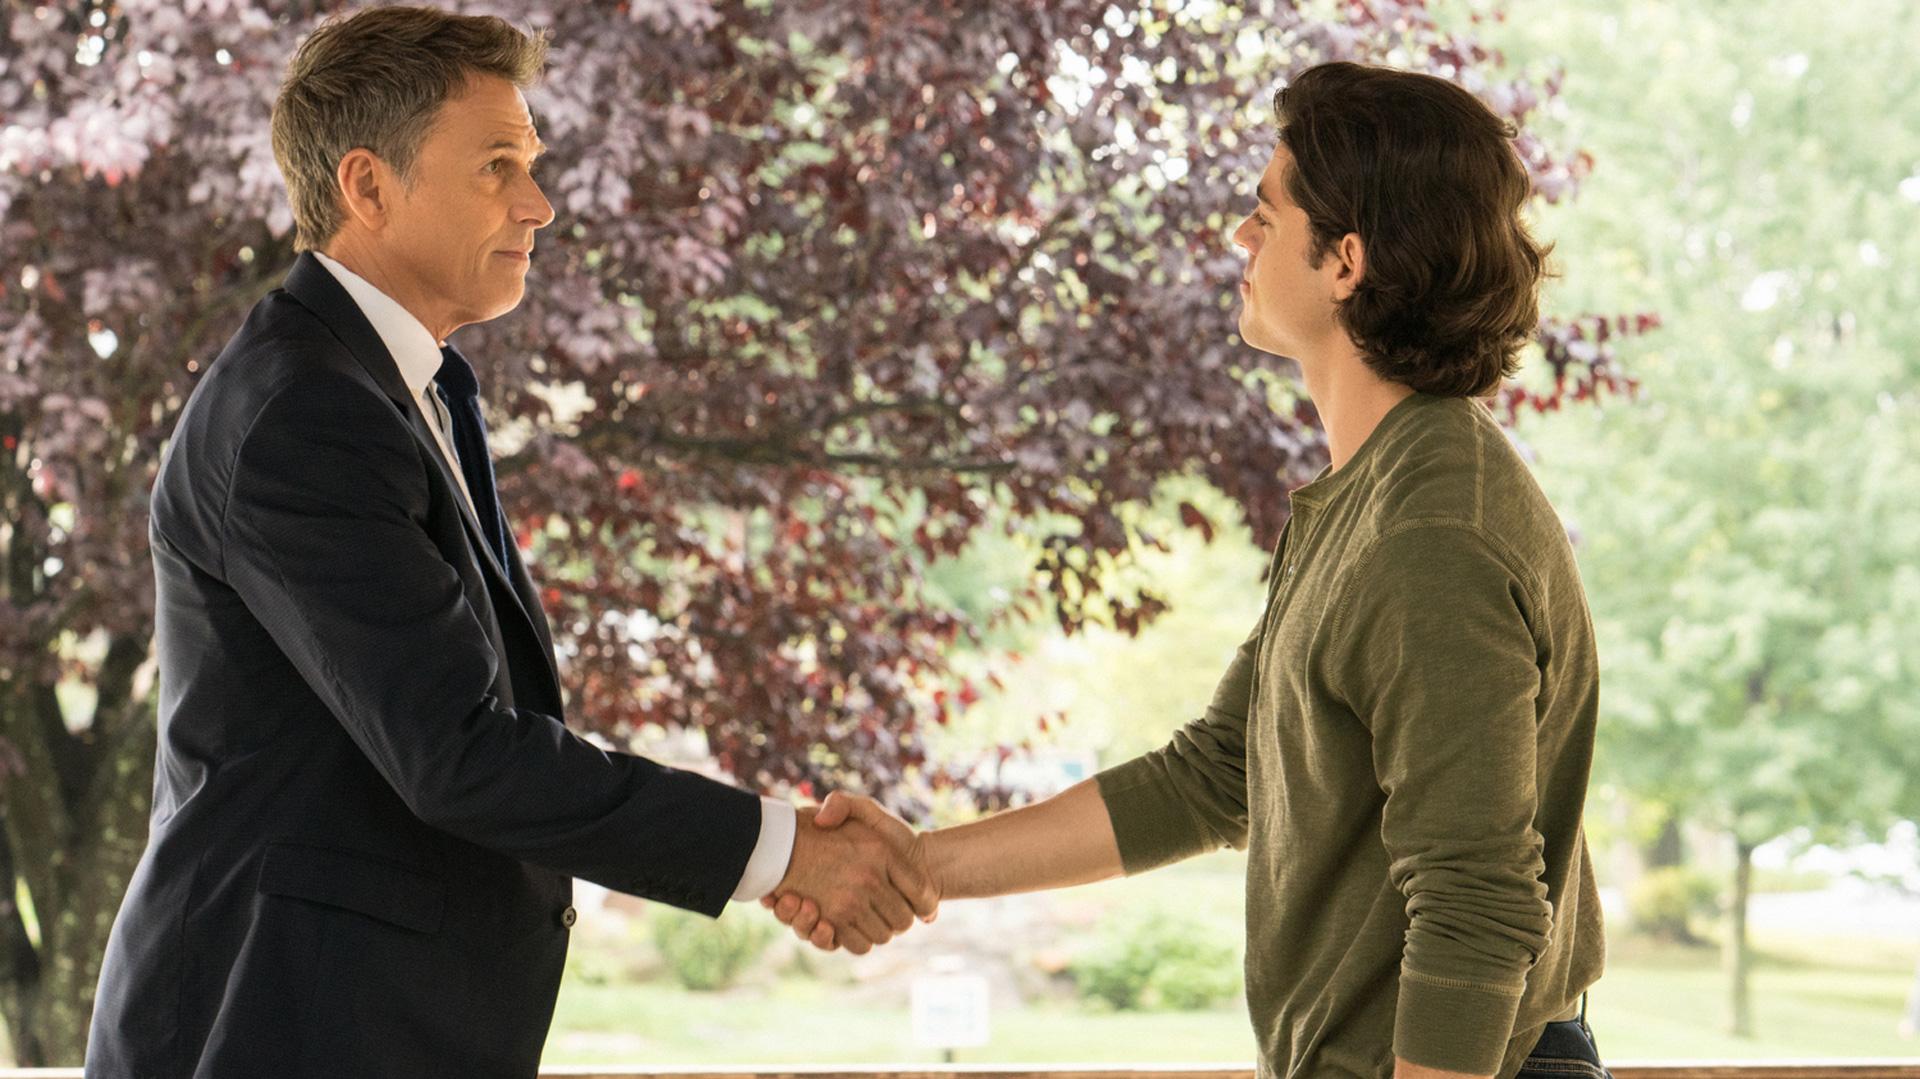 Tim Daly (Henry McCord) shakes Chris Petrovski's (Dmitri Petrov) hand.